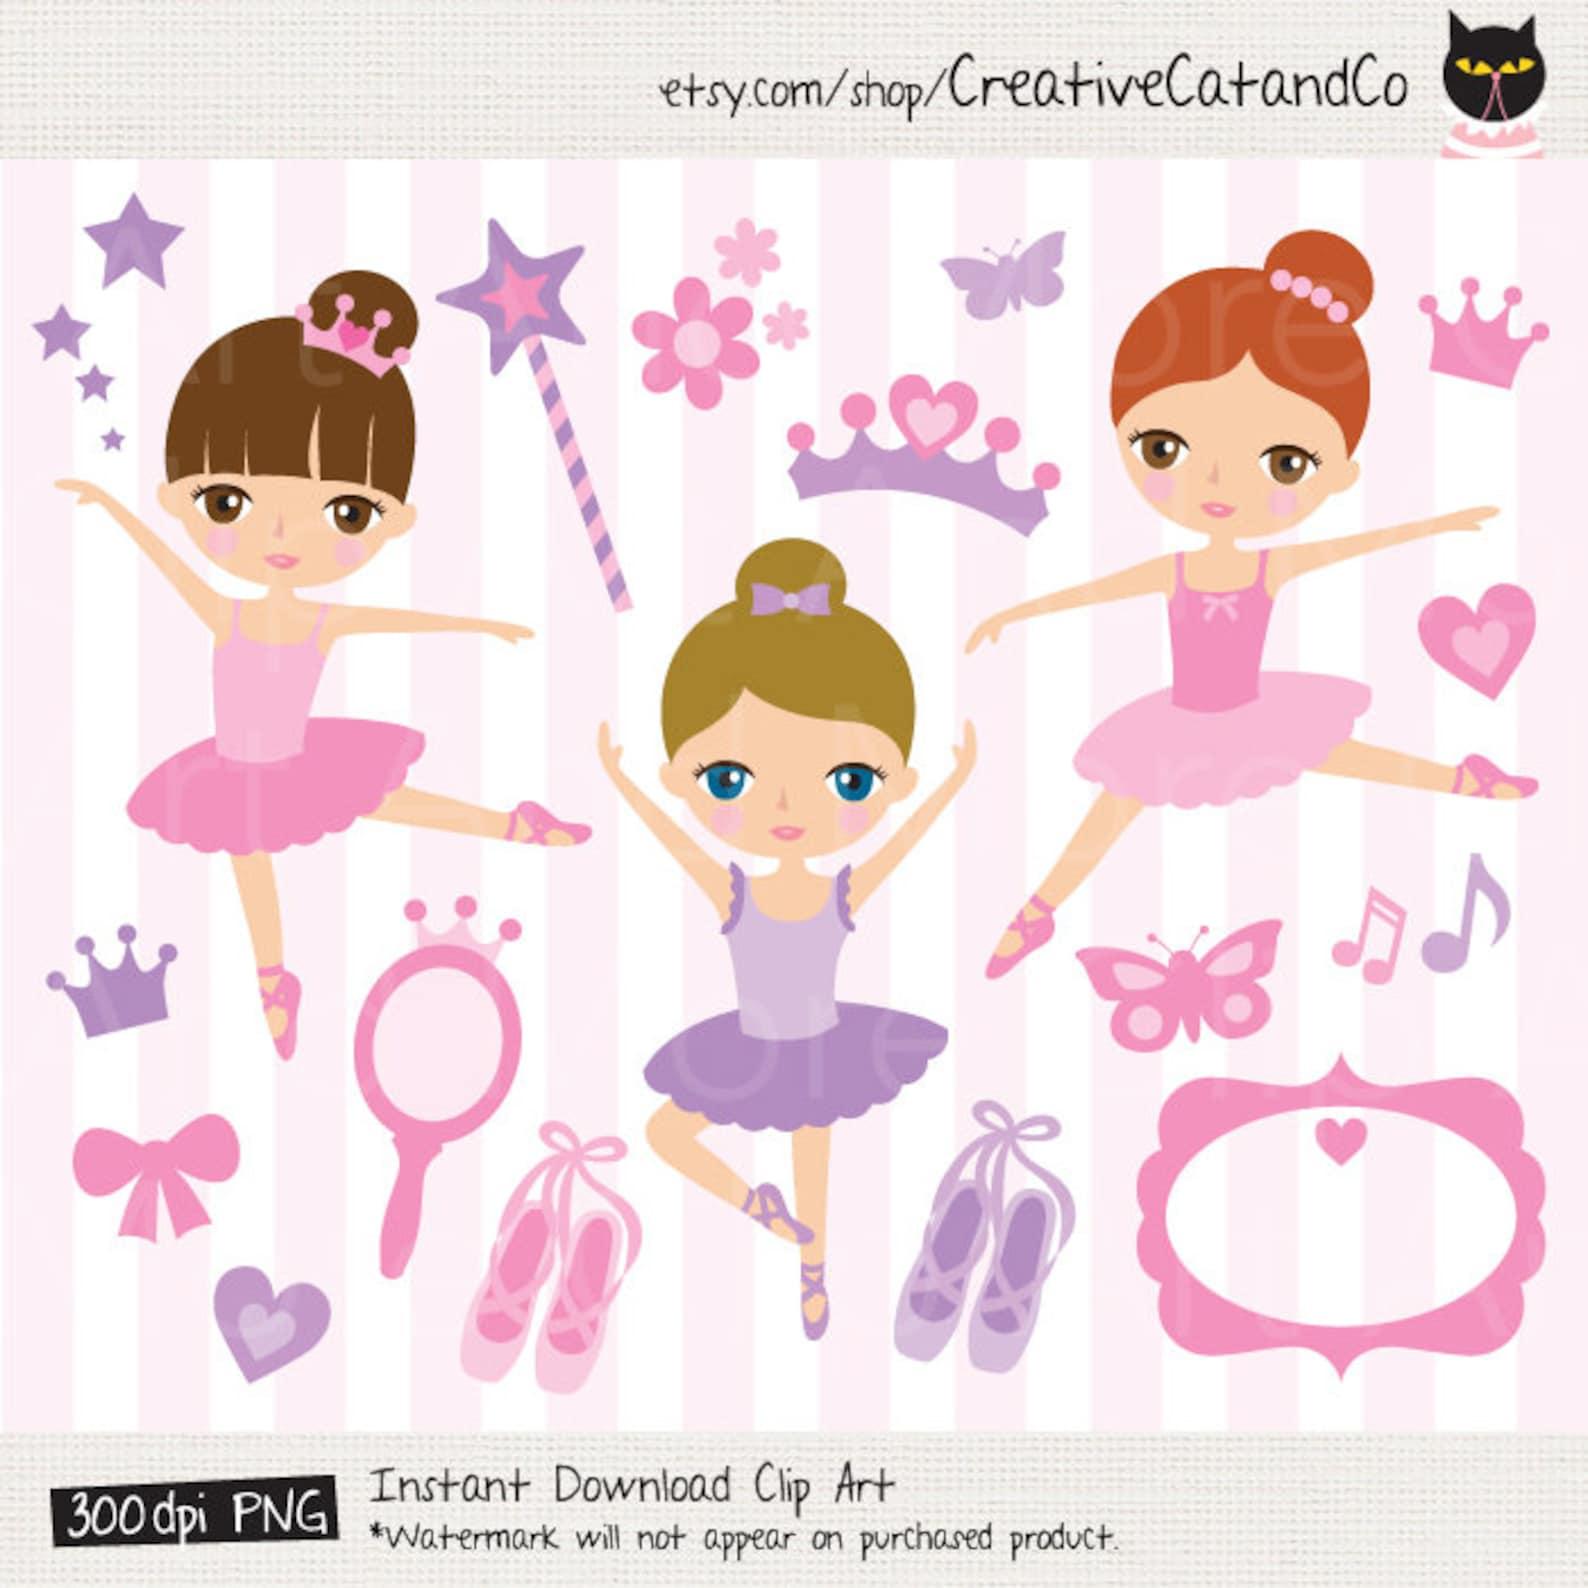 ballerina clipart ballet clipart girl ballerina clip art girl ballet clipart dance clipart ballet shoe clipart girl dancer clipa